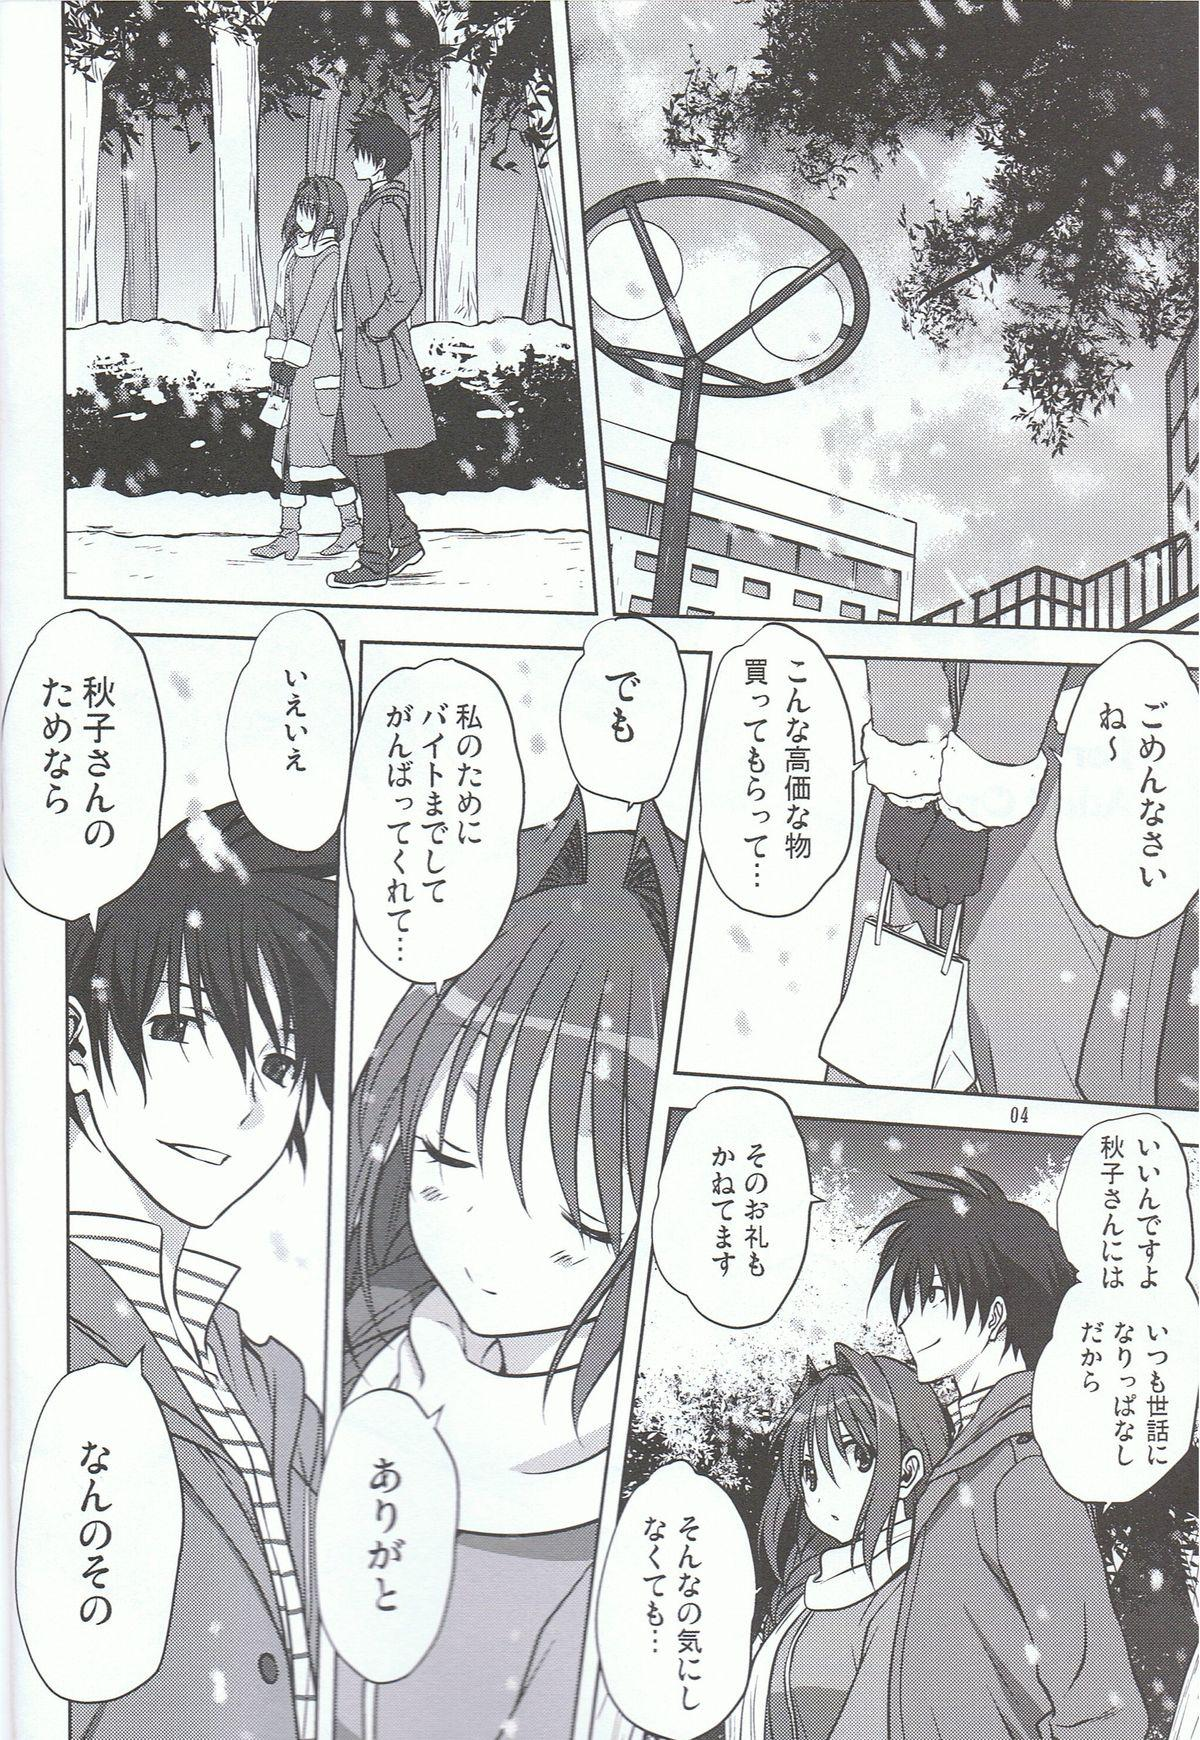 Akiko-san to Issho 13 2